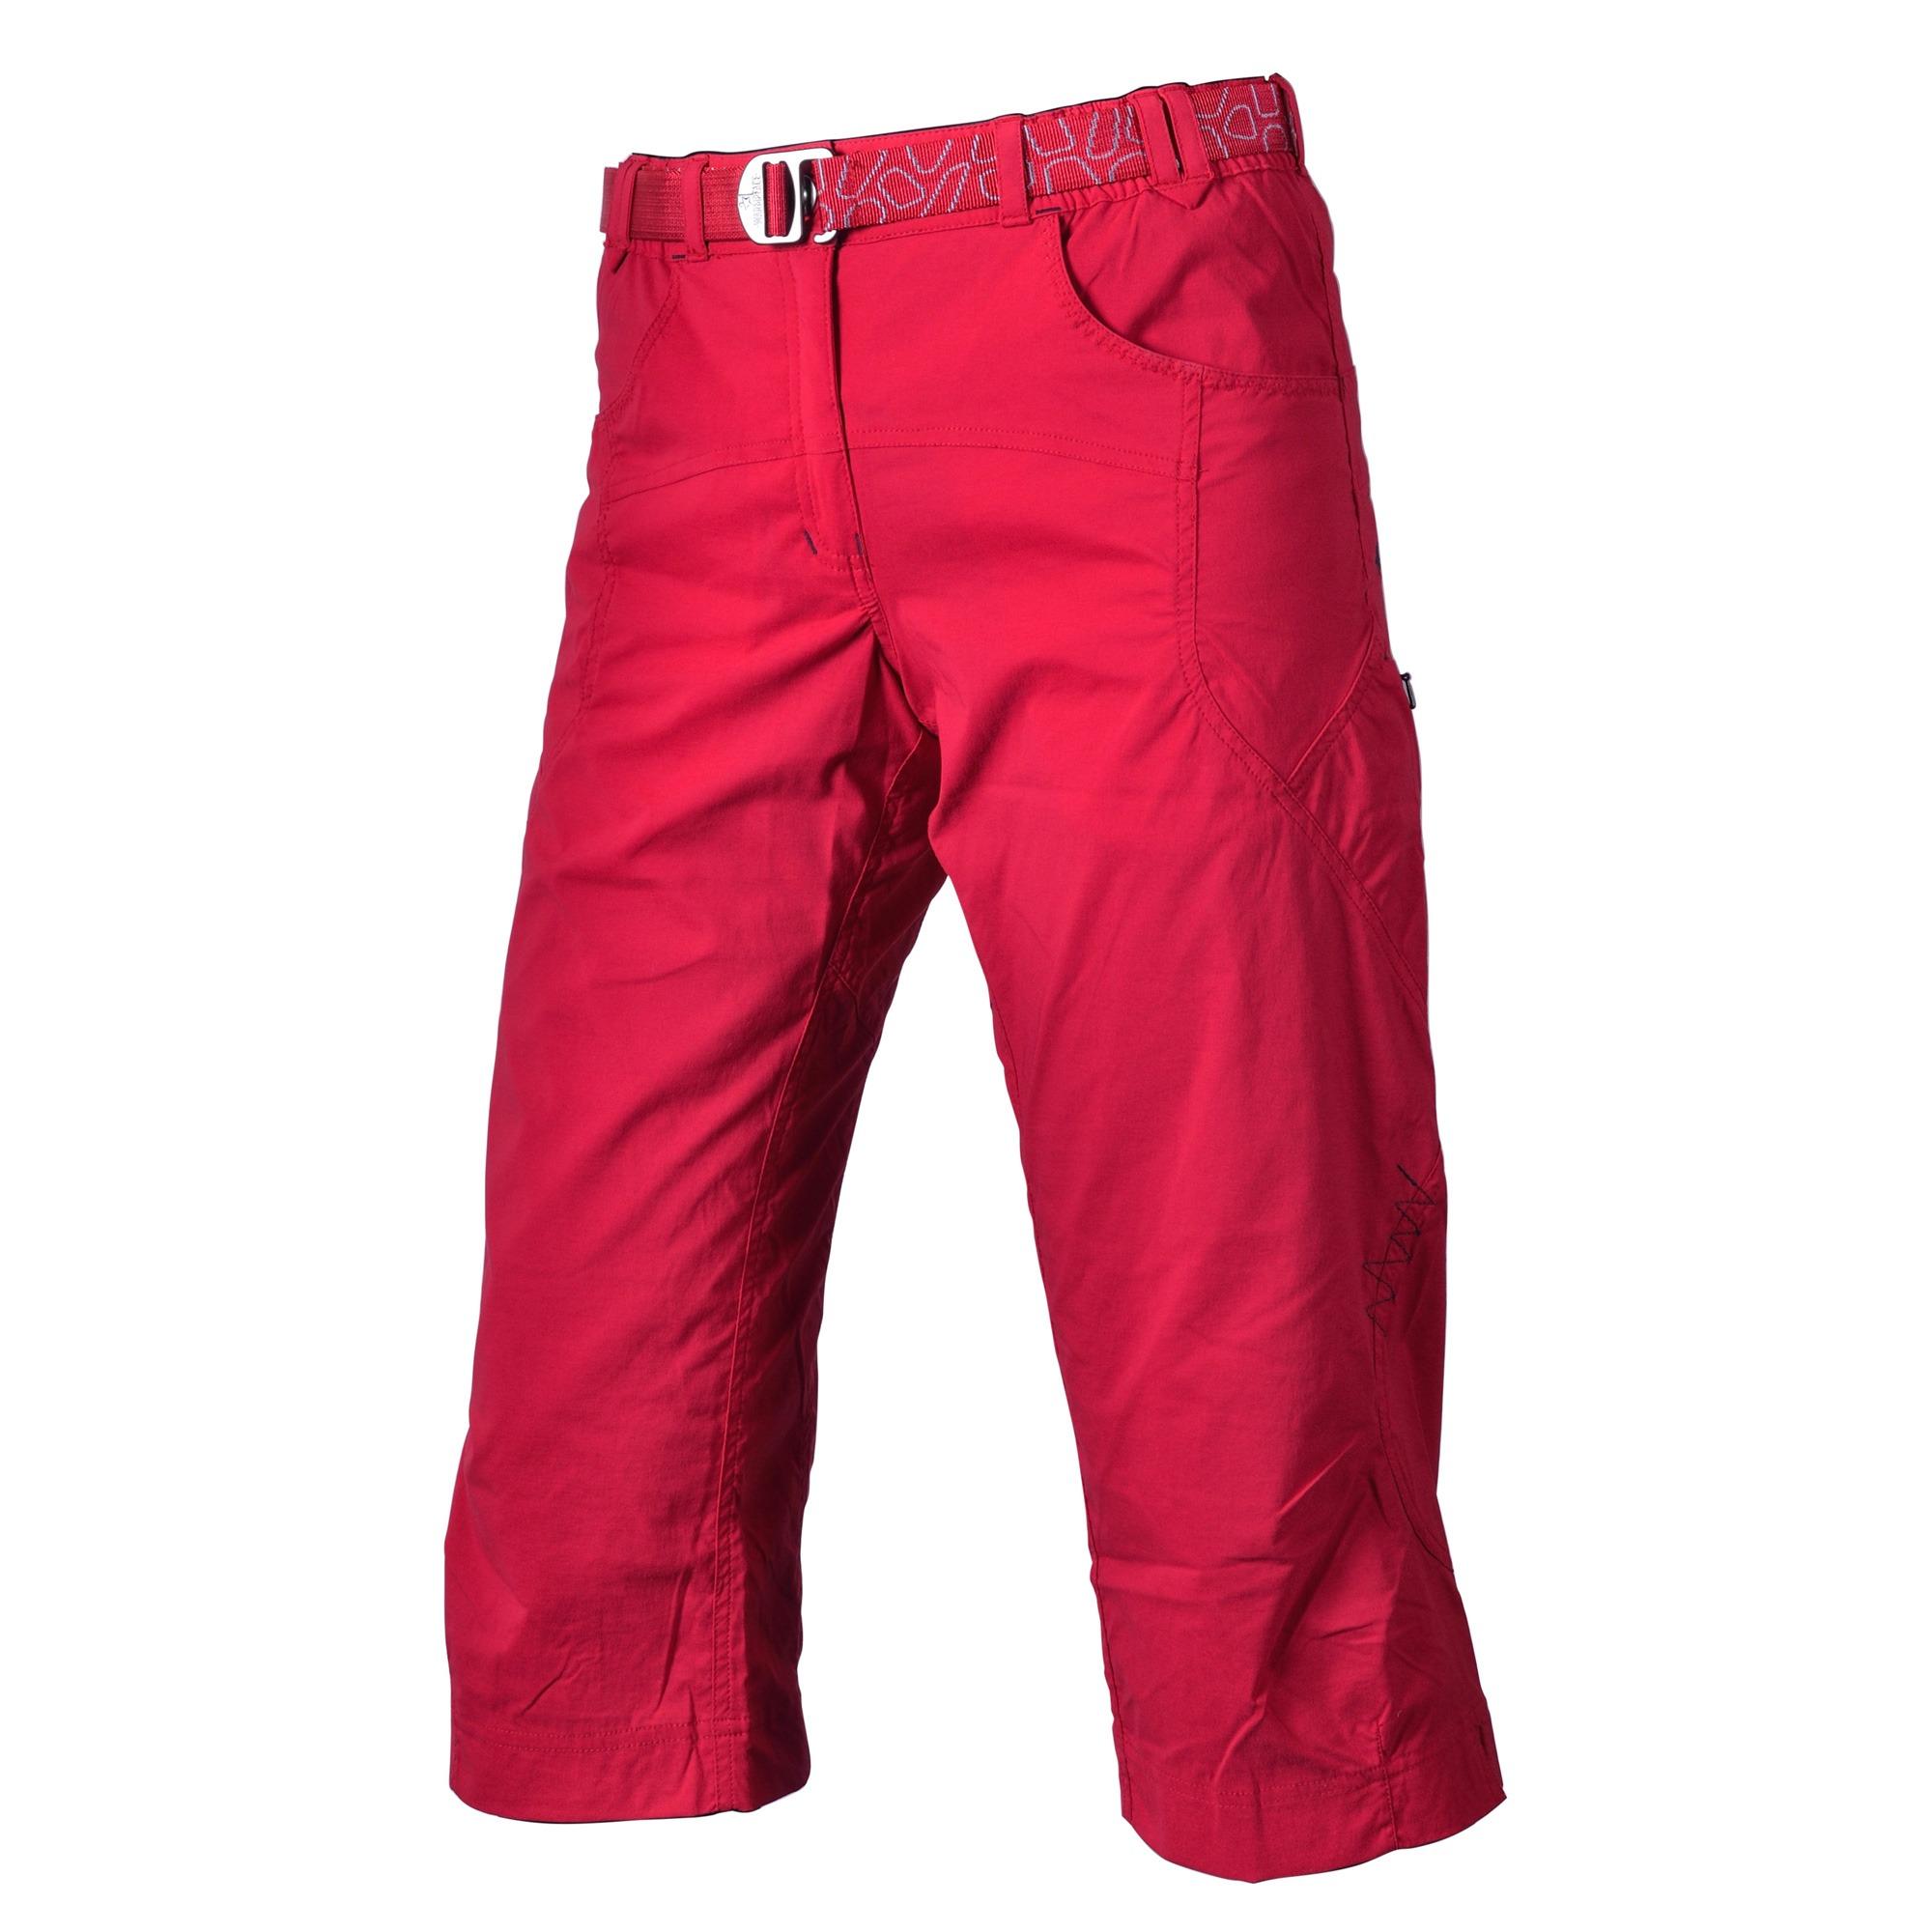 Pantaloni Warmpeace Flex 3/4 Lady - Rosu